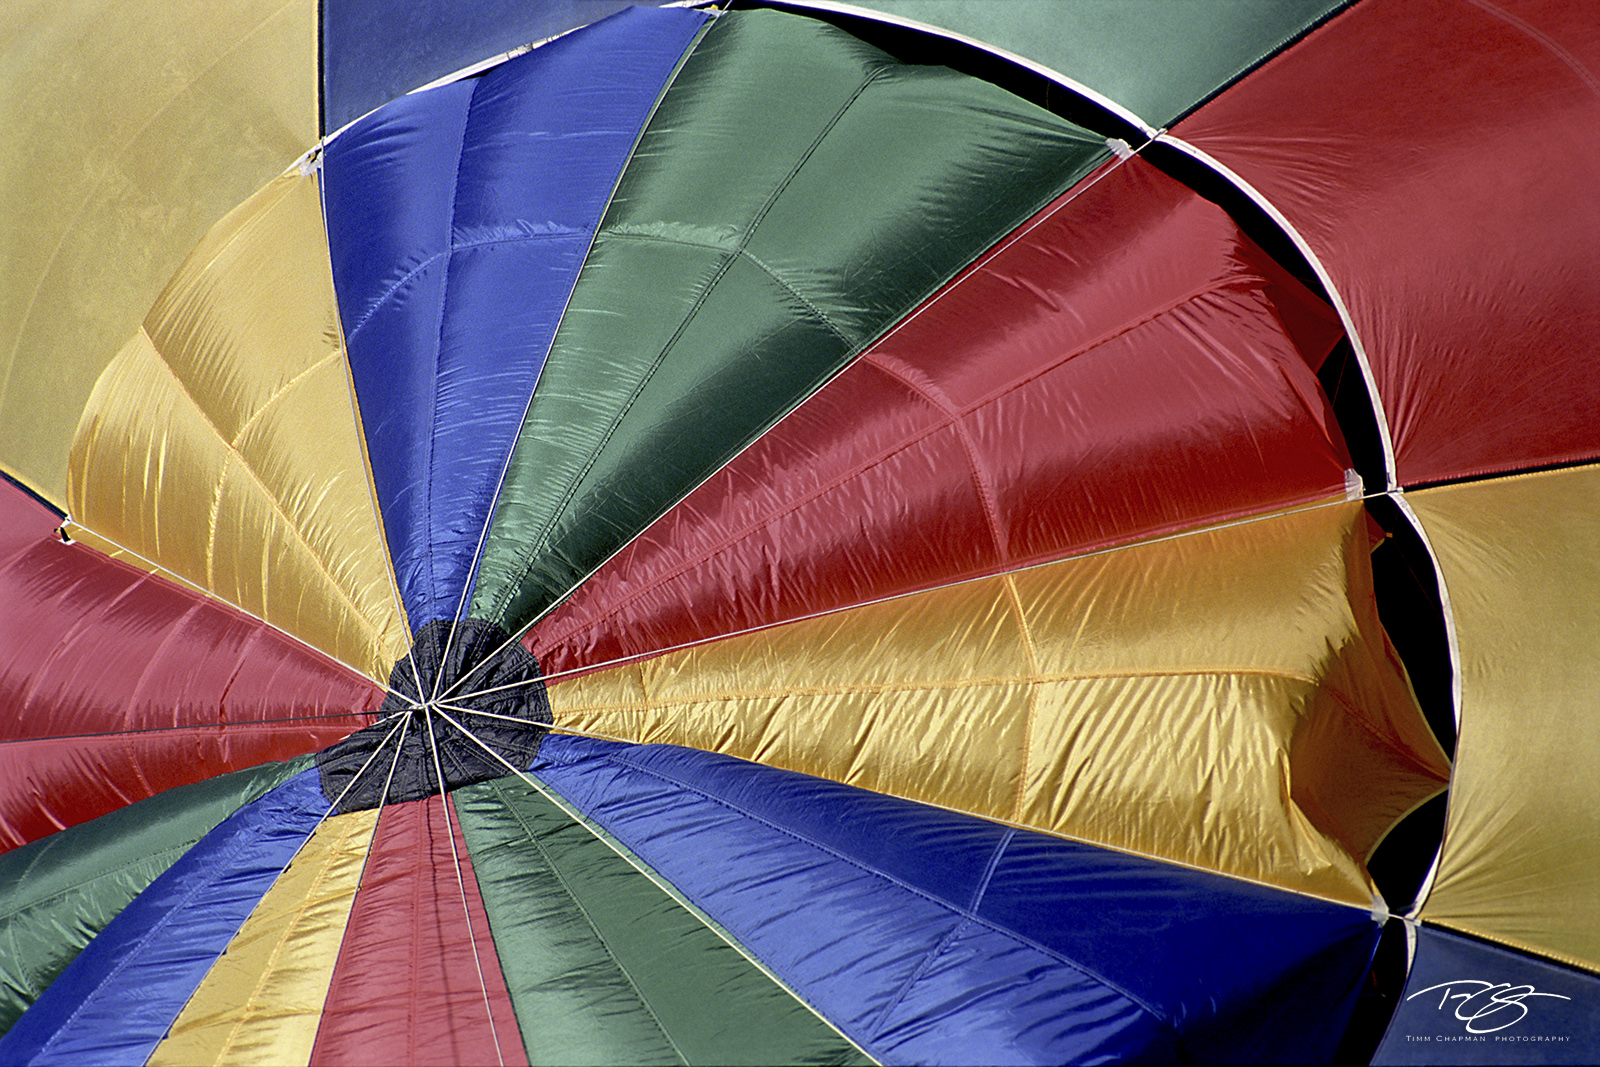 balloon, hot air balloon, ripples, abstract, kaleidoscope, swirl, multi colored, fabric, rippling, fiesta, new mexico, photo